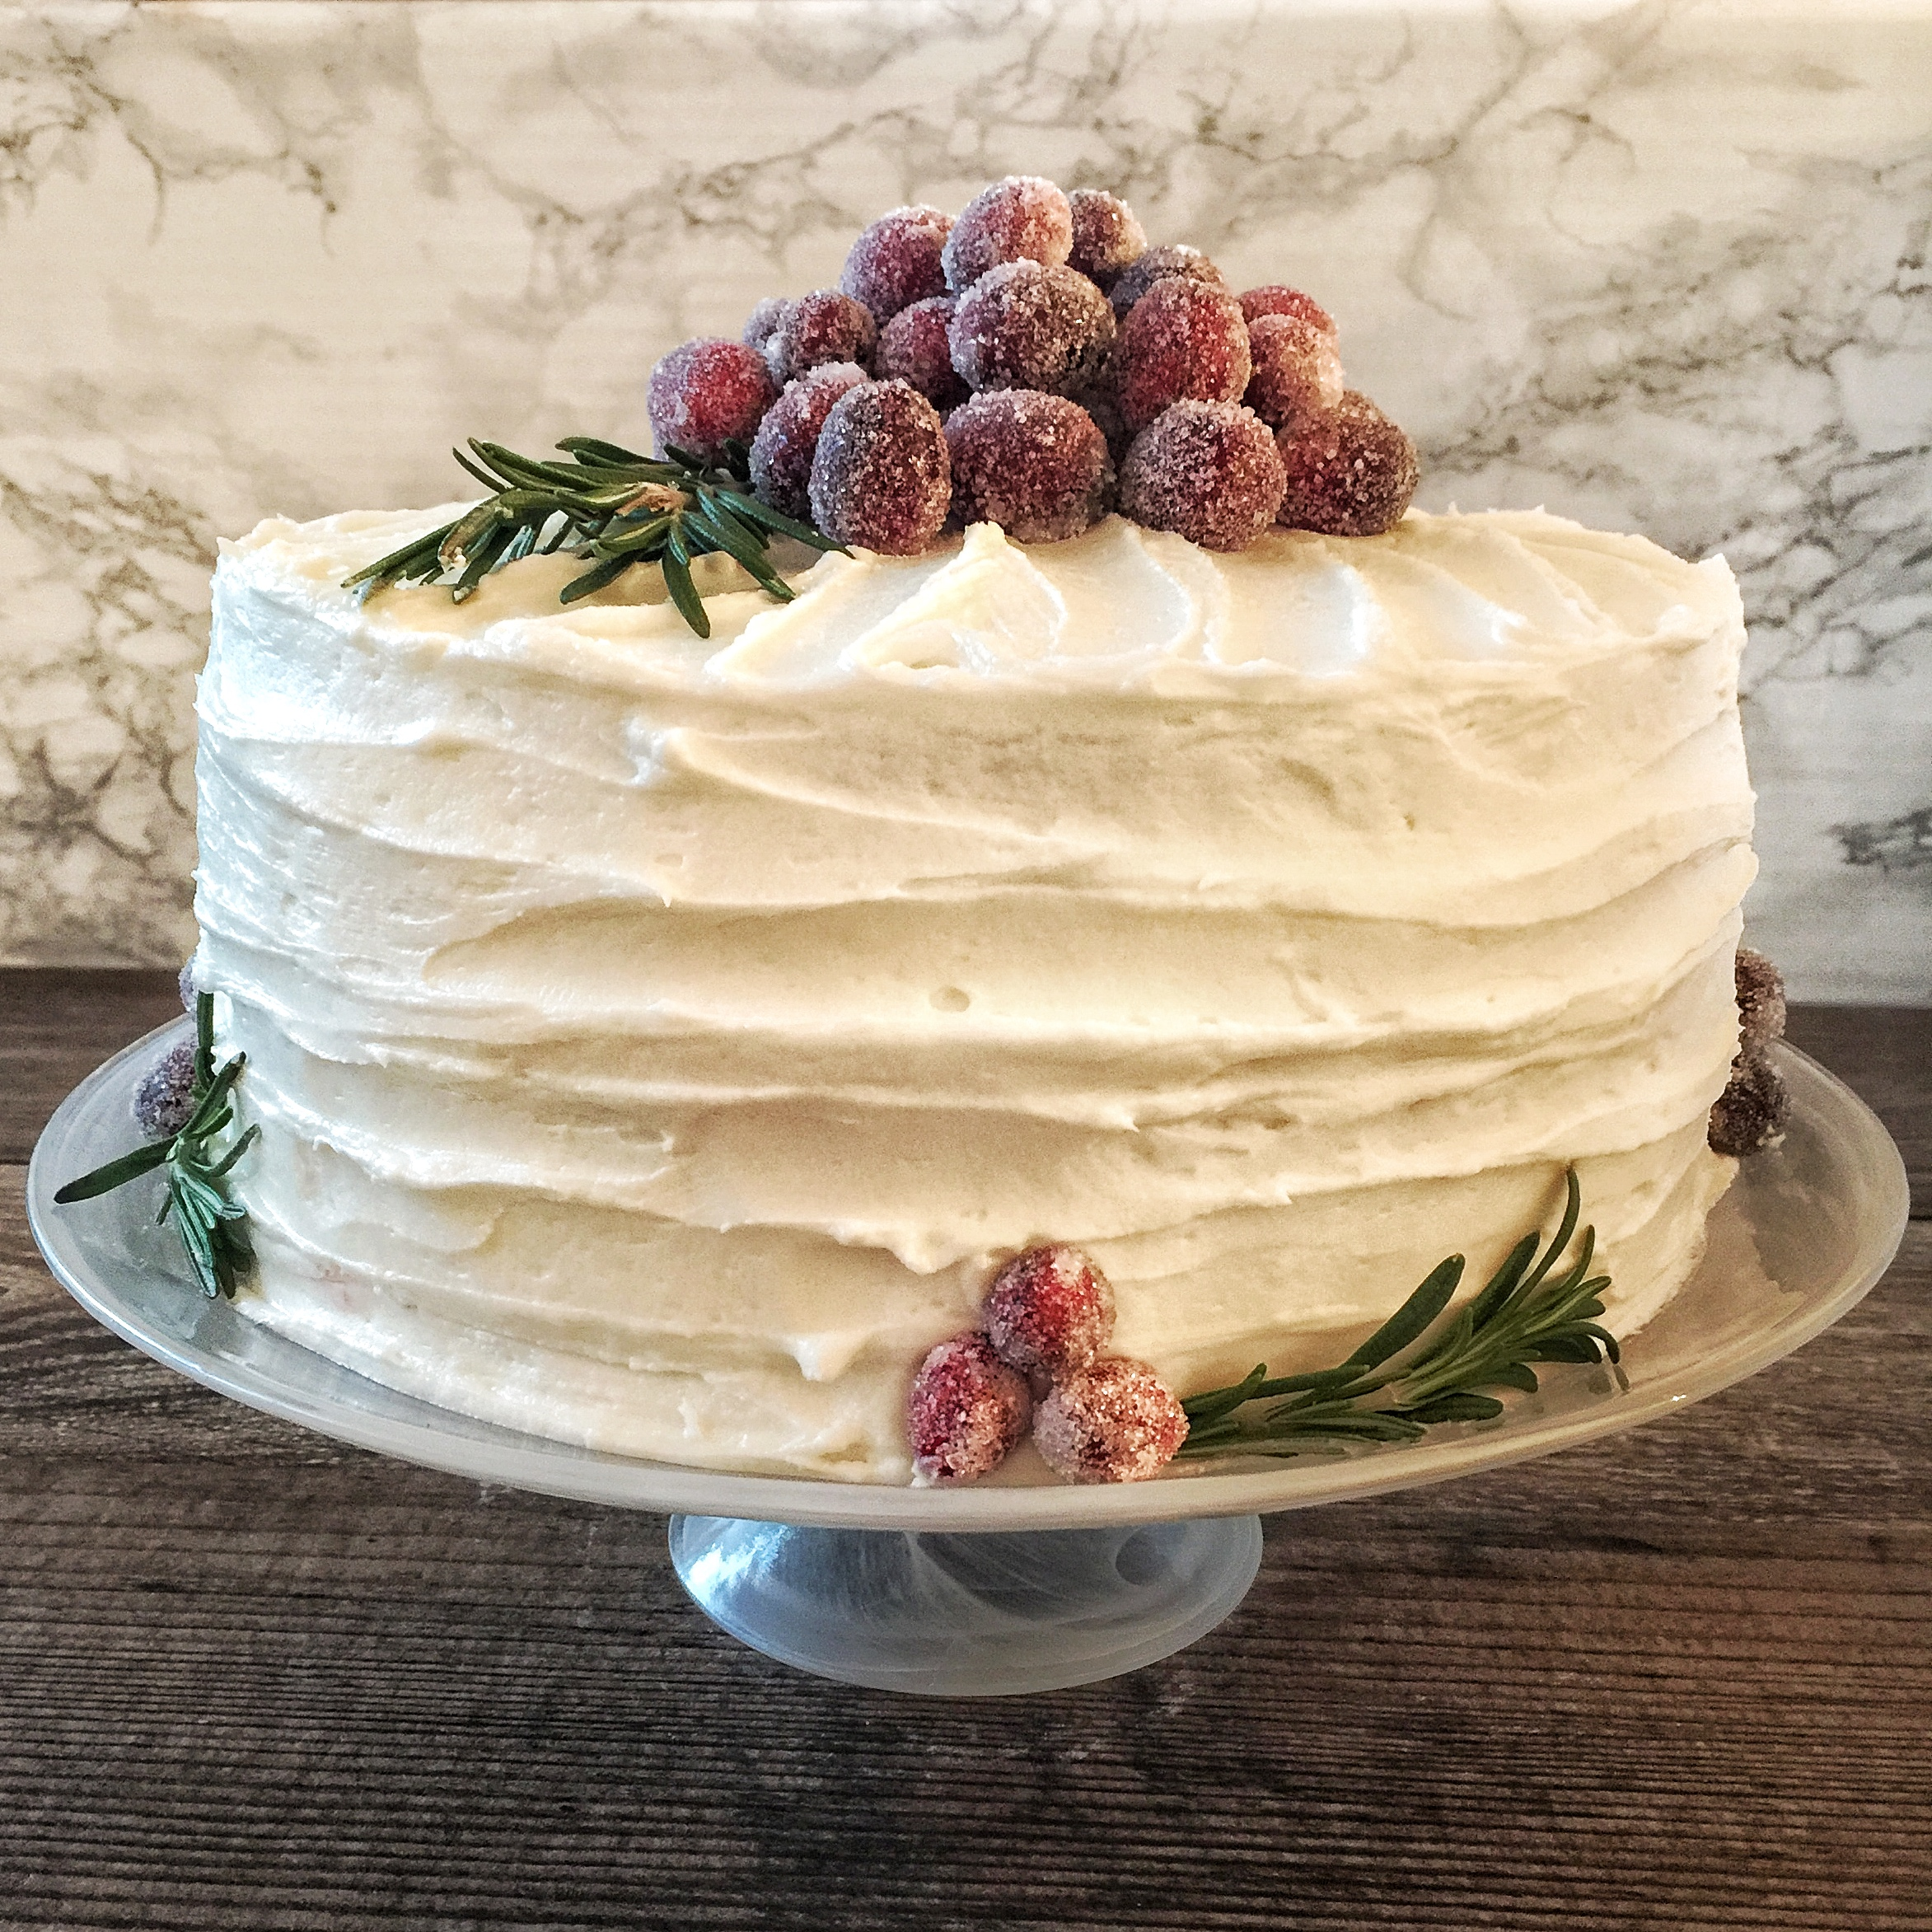 Festive Italian Cream Cake with Cranberry Curd & Sugared Cranberries